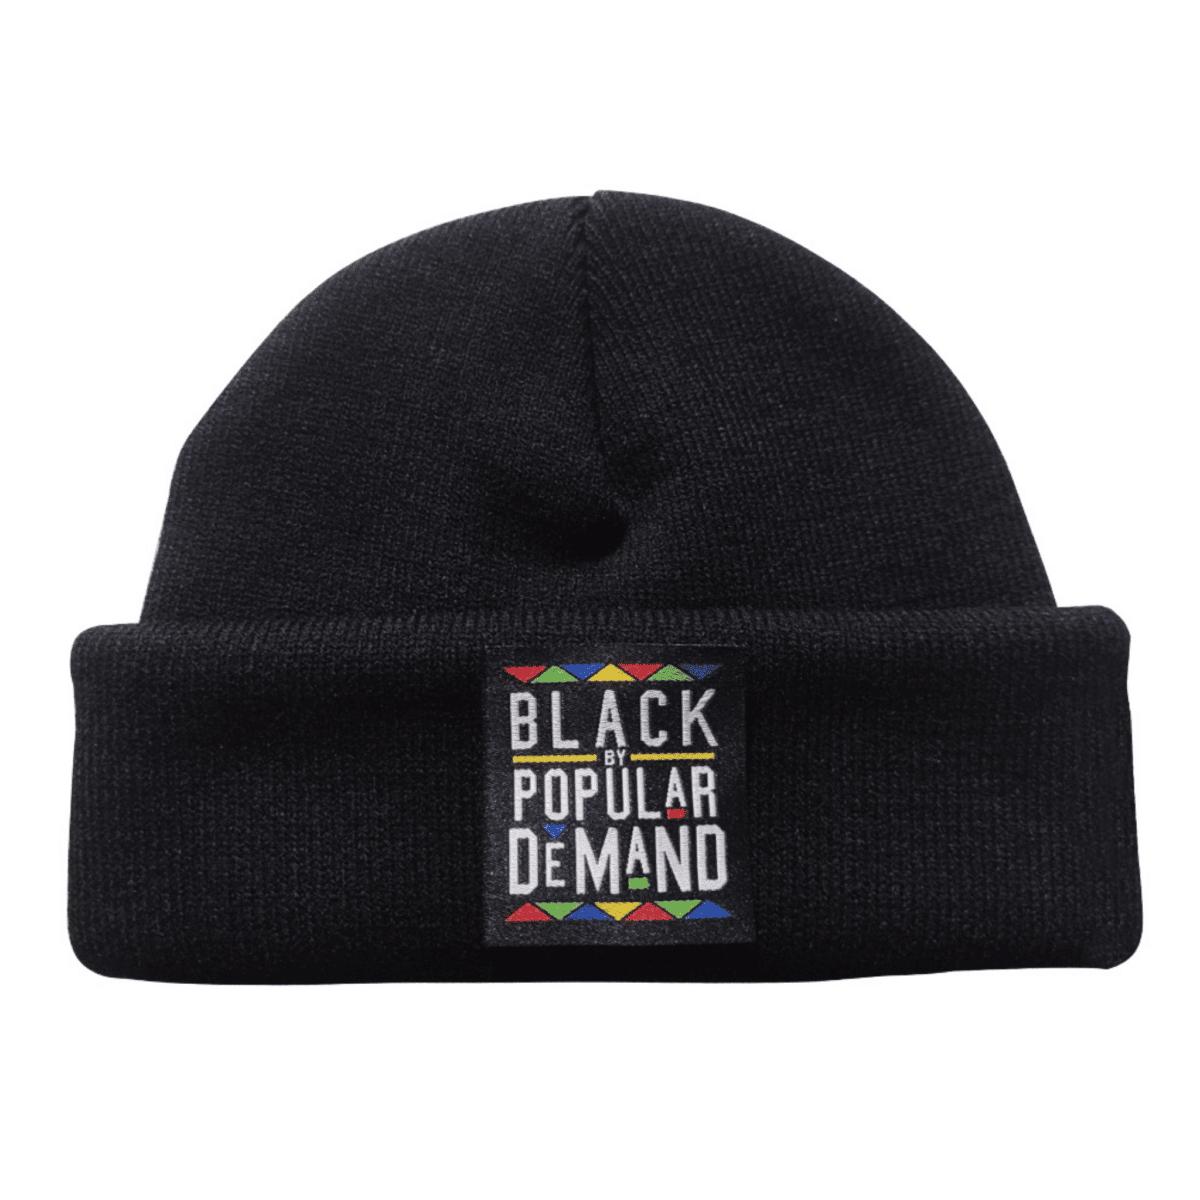 Black By Popular Demand® Black Unisex Beanie HGC Apparel